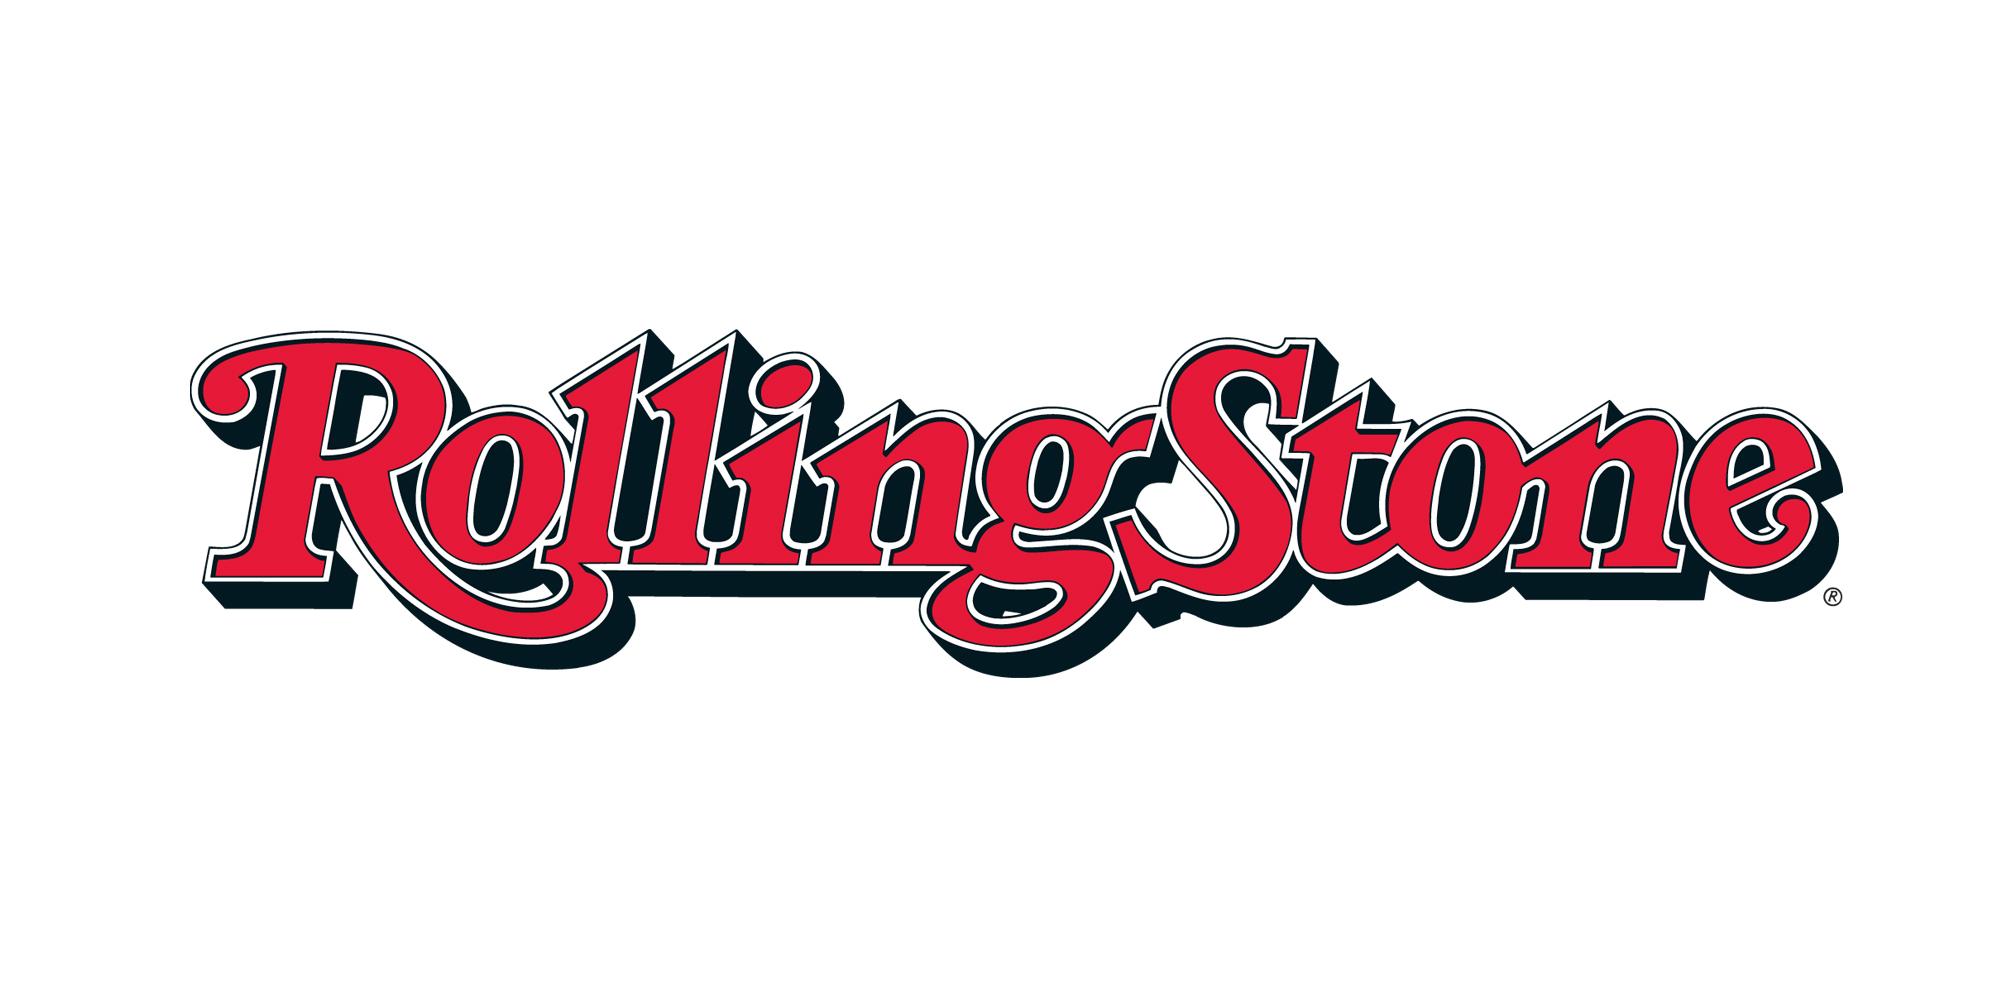 Rolling-Stone-LOGO.jpg